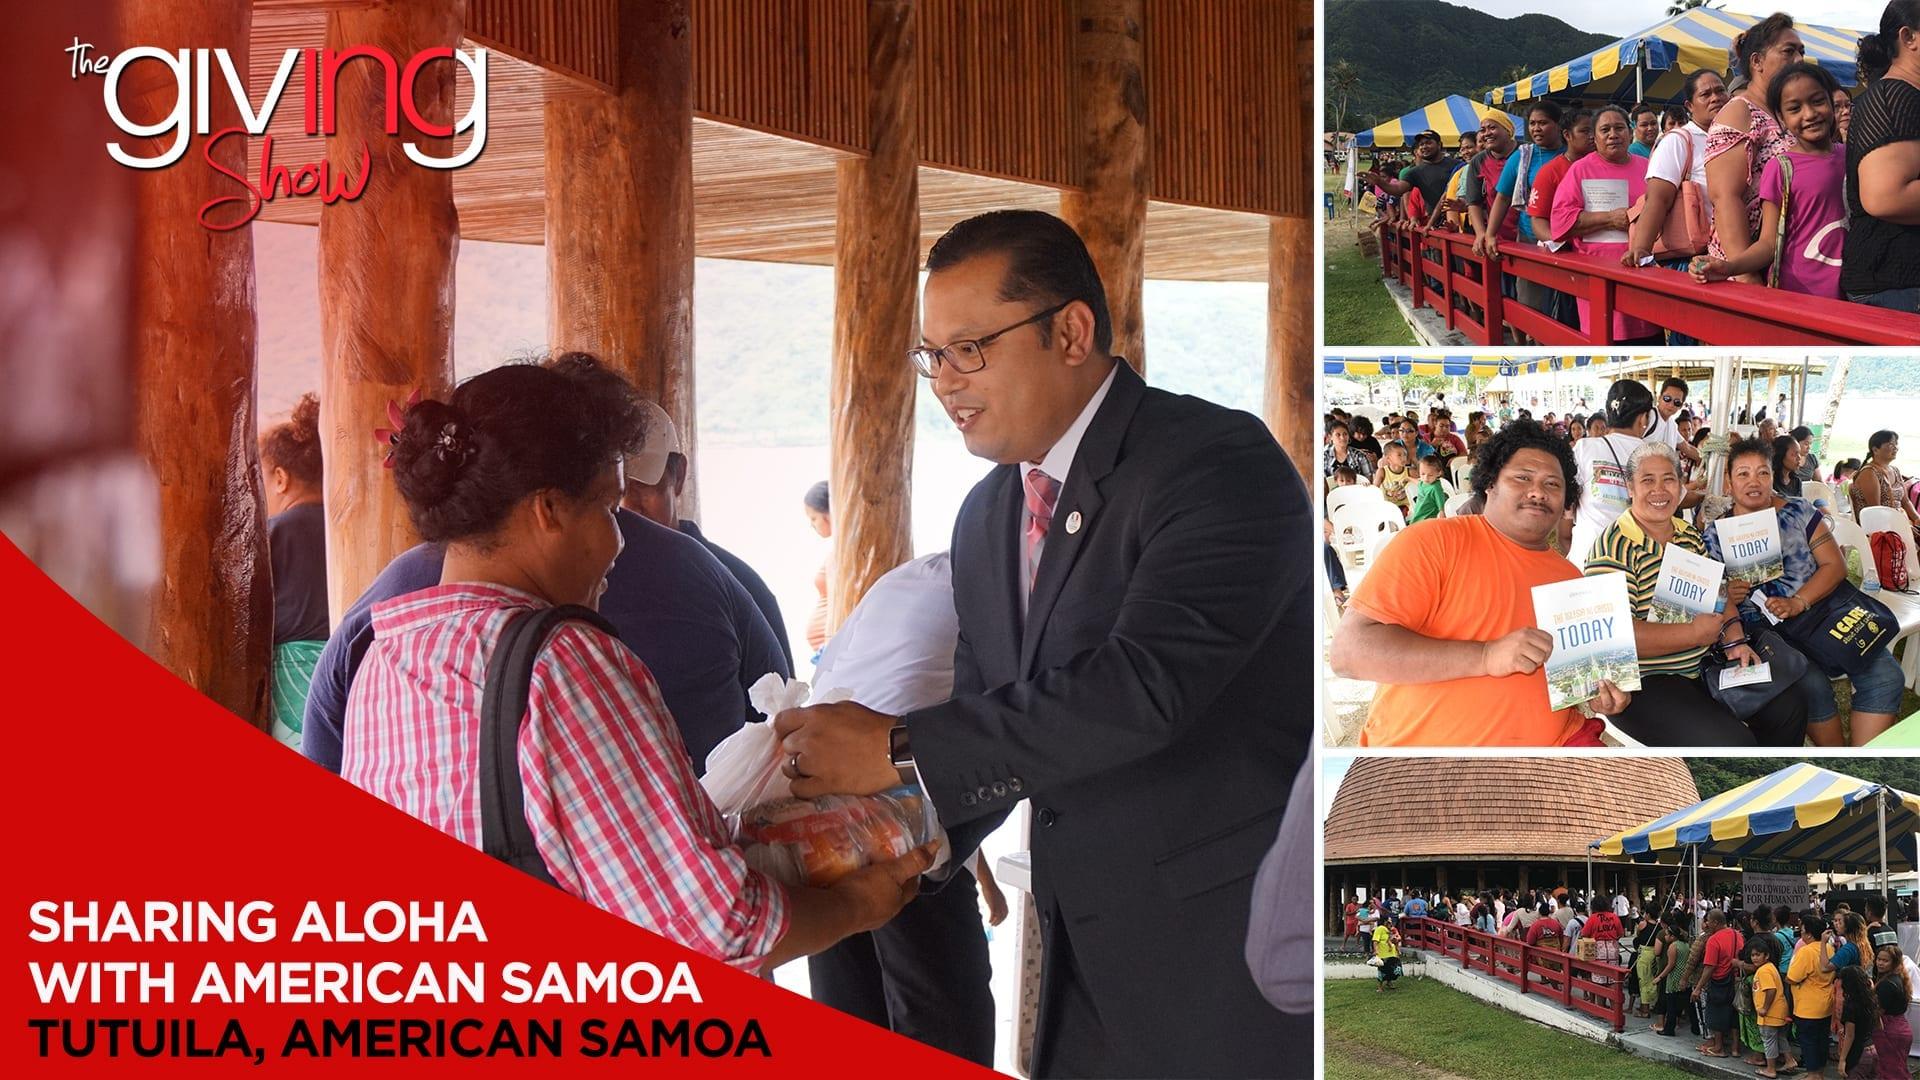 Greeting American Samoa with Goods